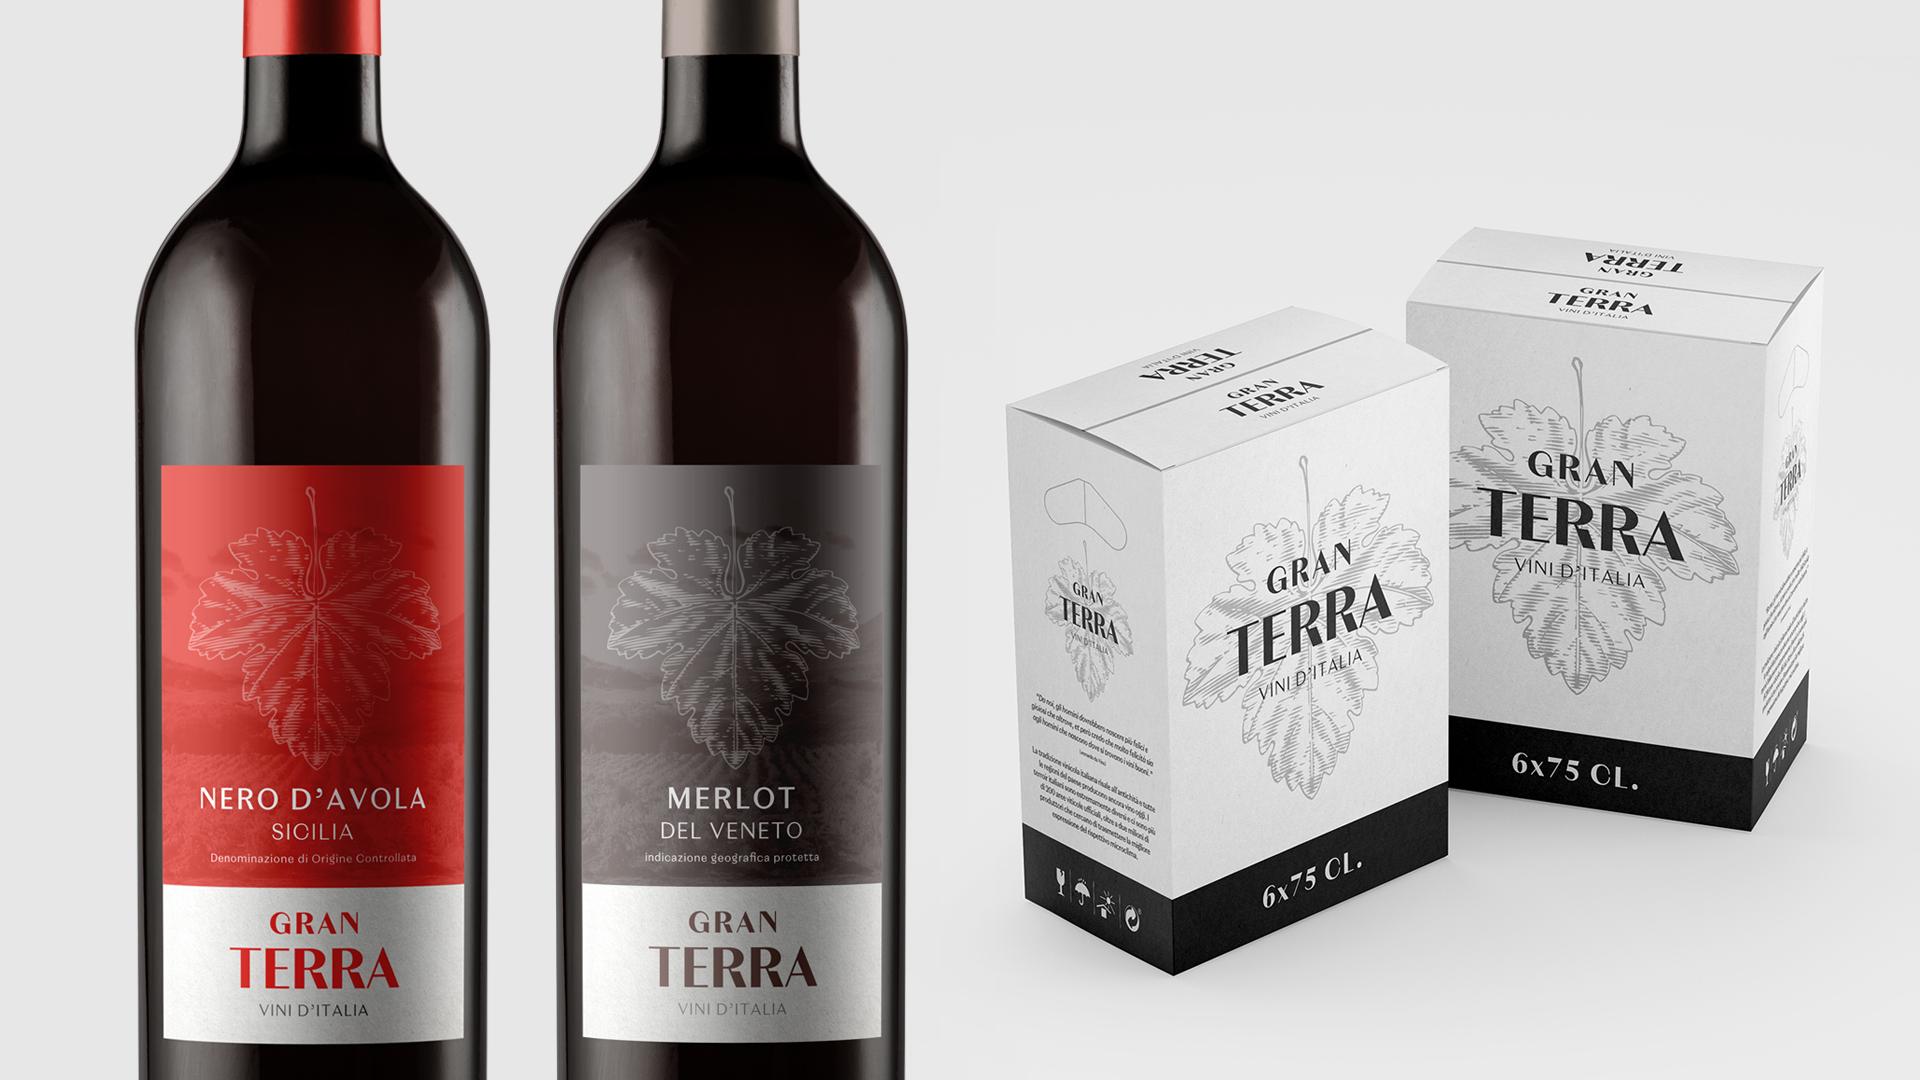 Design de rótulo e caixa para vinho Gran Terra